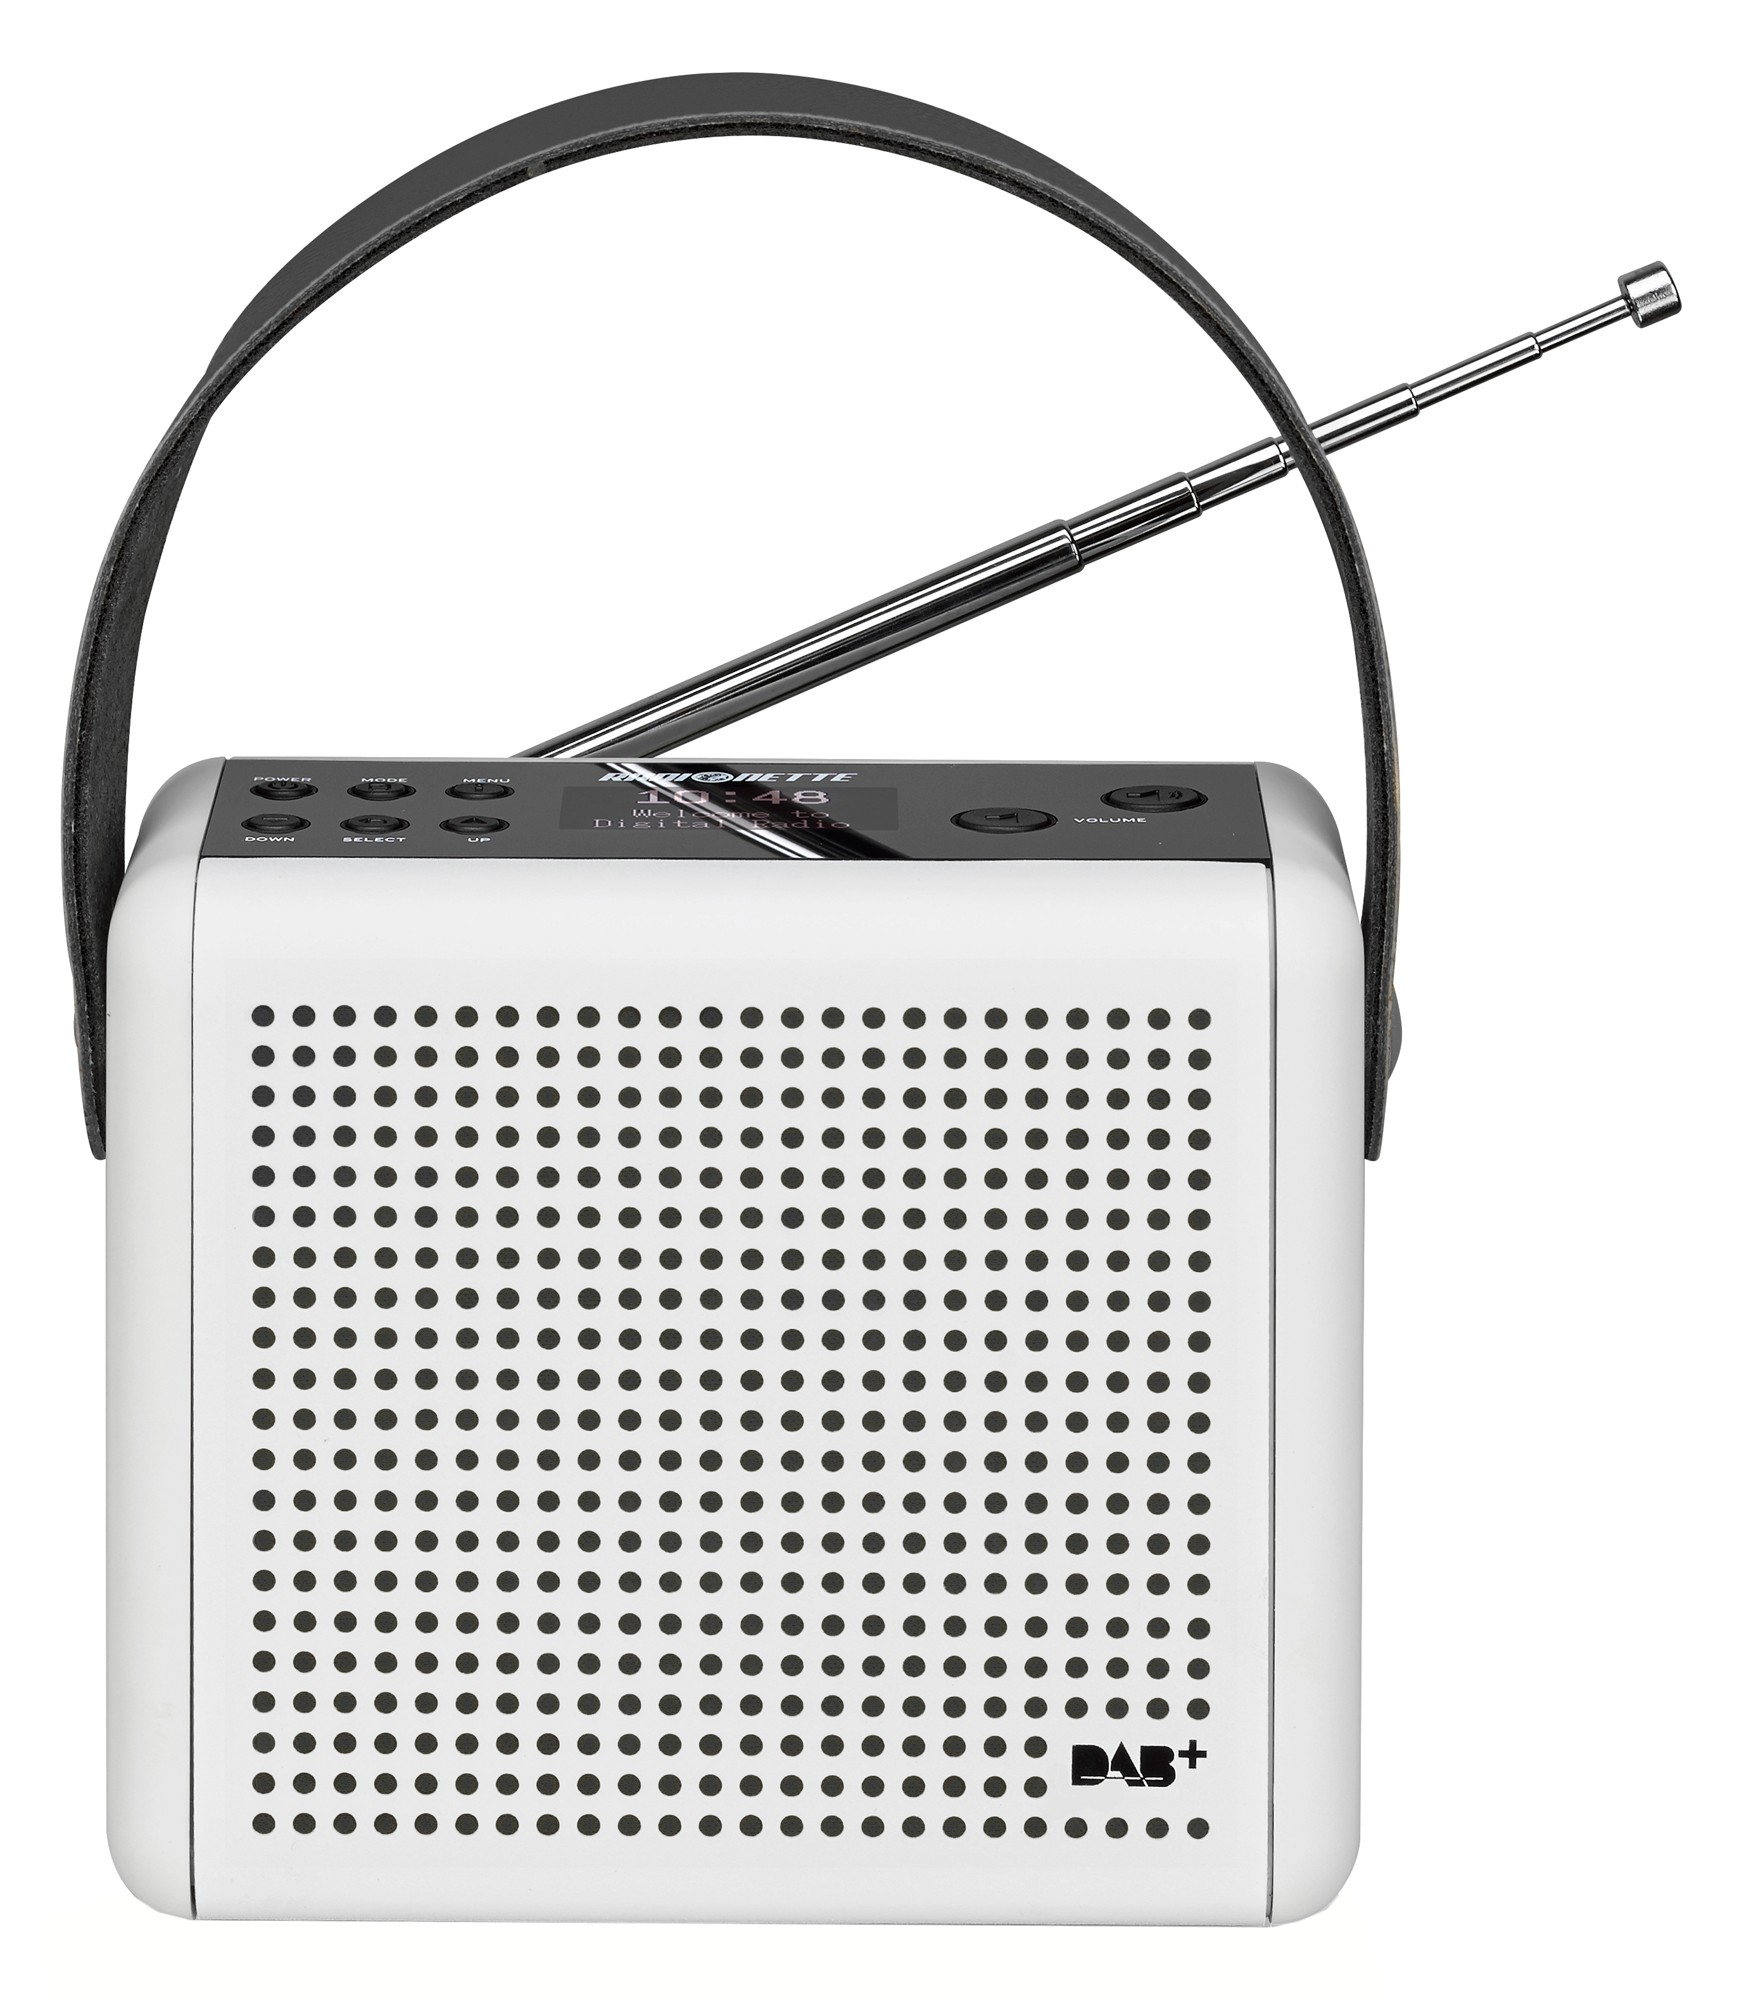 83508 : Radionette DAB+/FM radio RNPDMW14E (hvit)